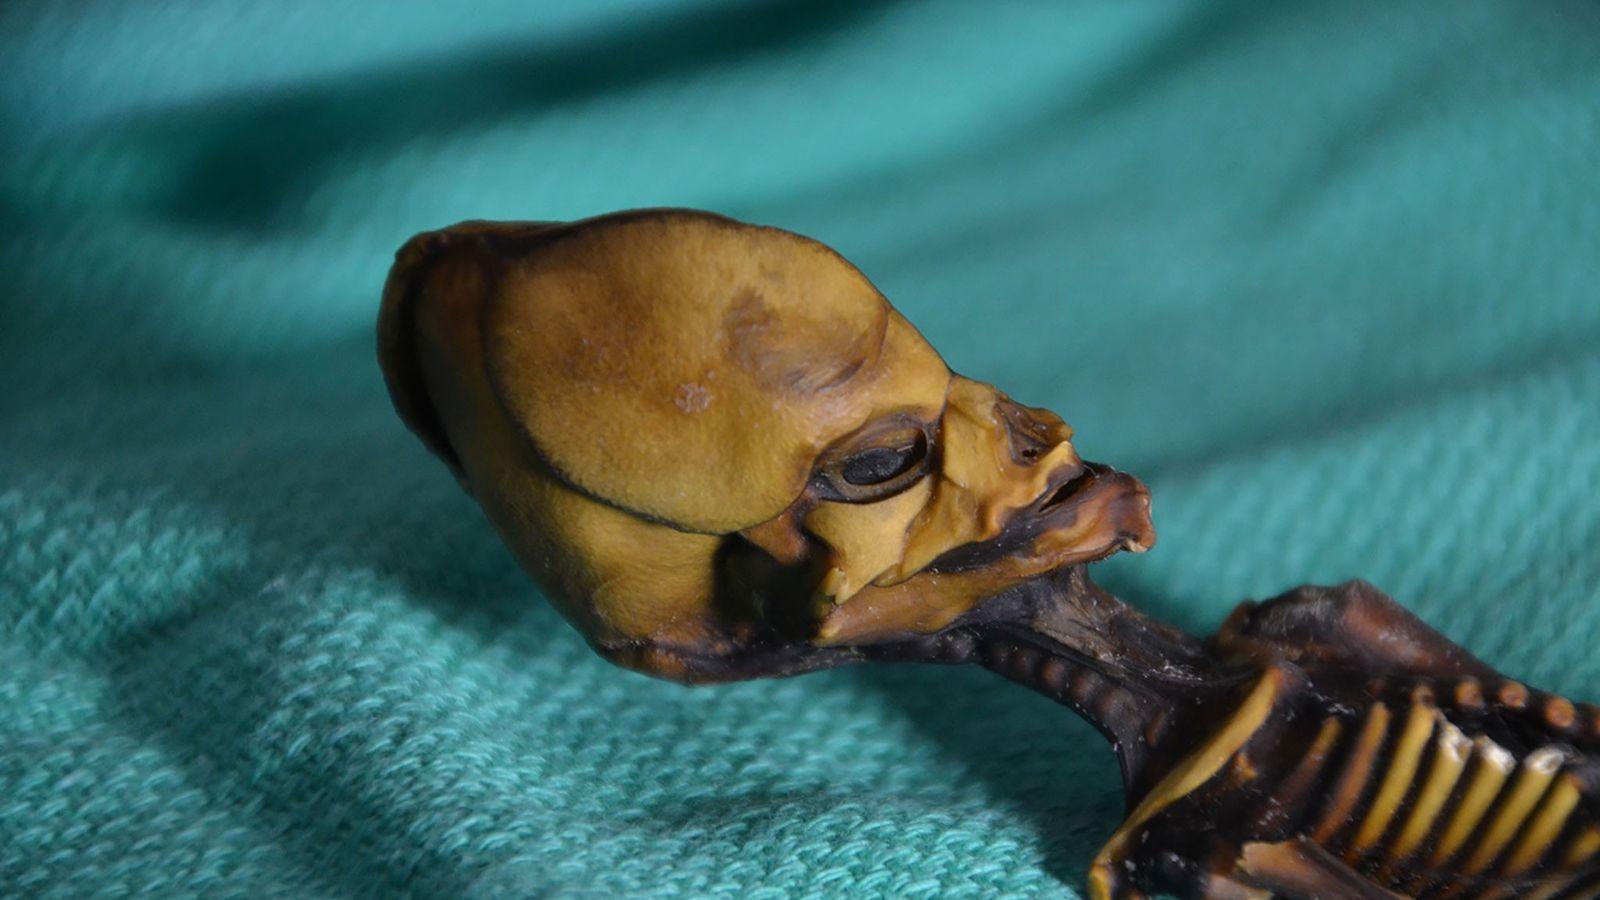 Ata, the six-inch mummy found in Chile's Atacama desert.